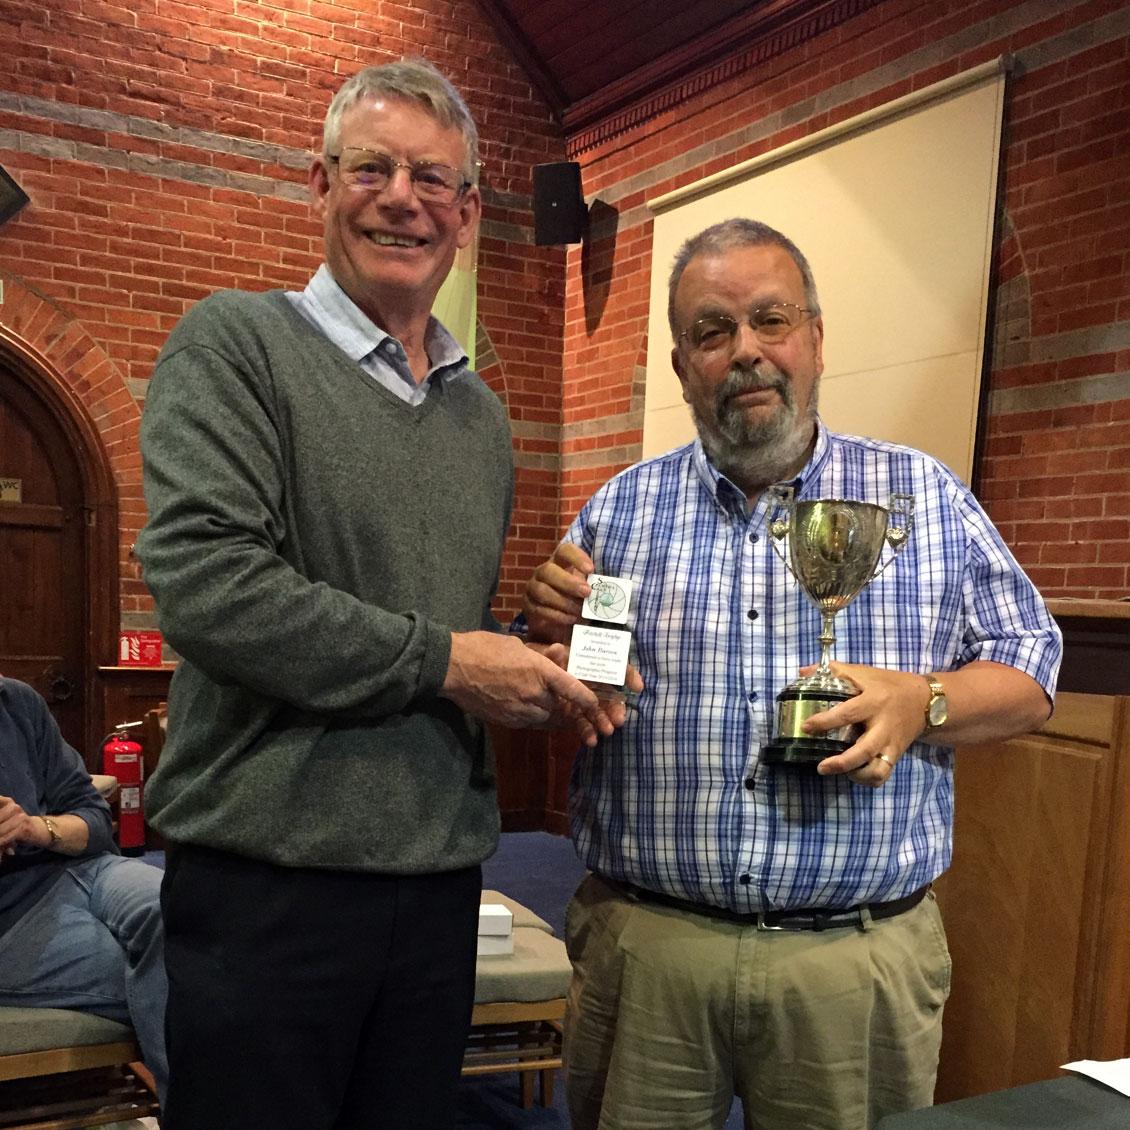 Petchell Trophy Winner John Barton